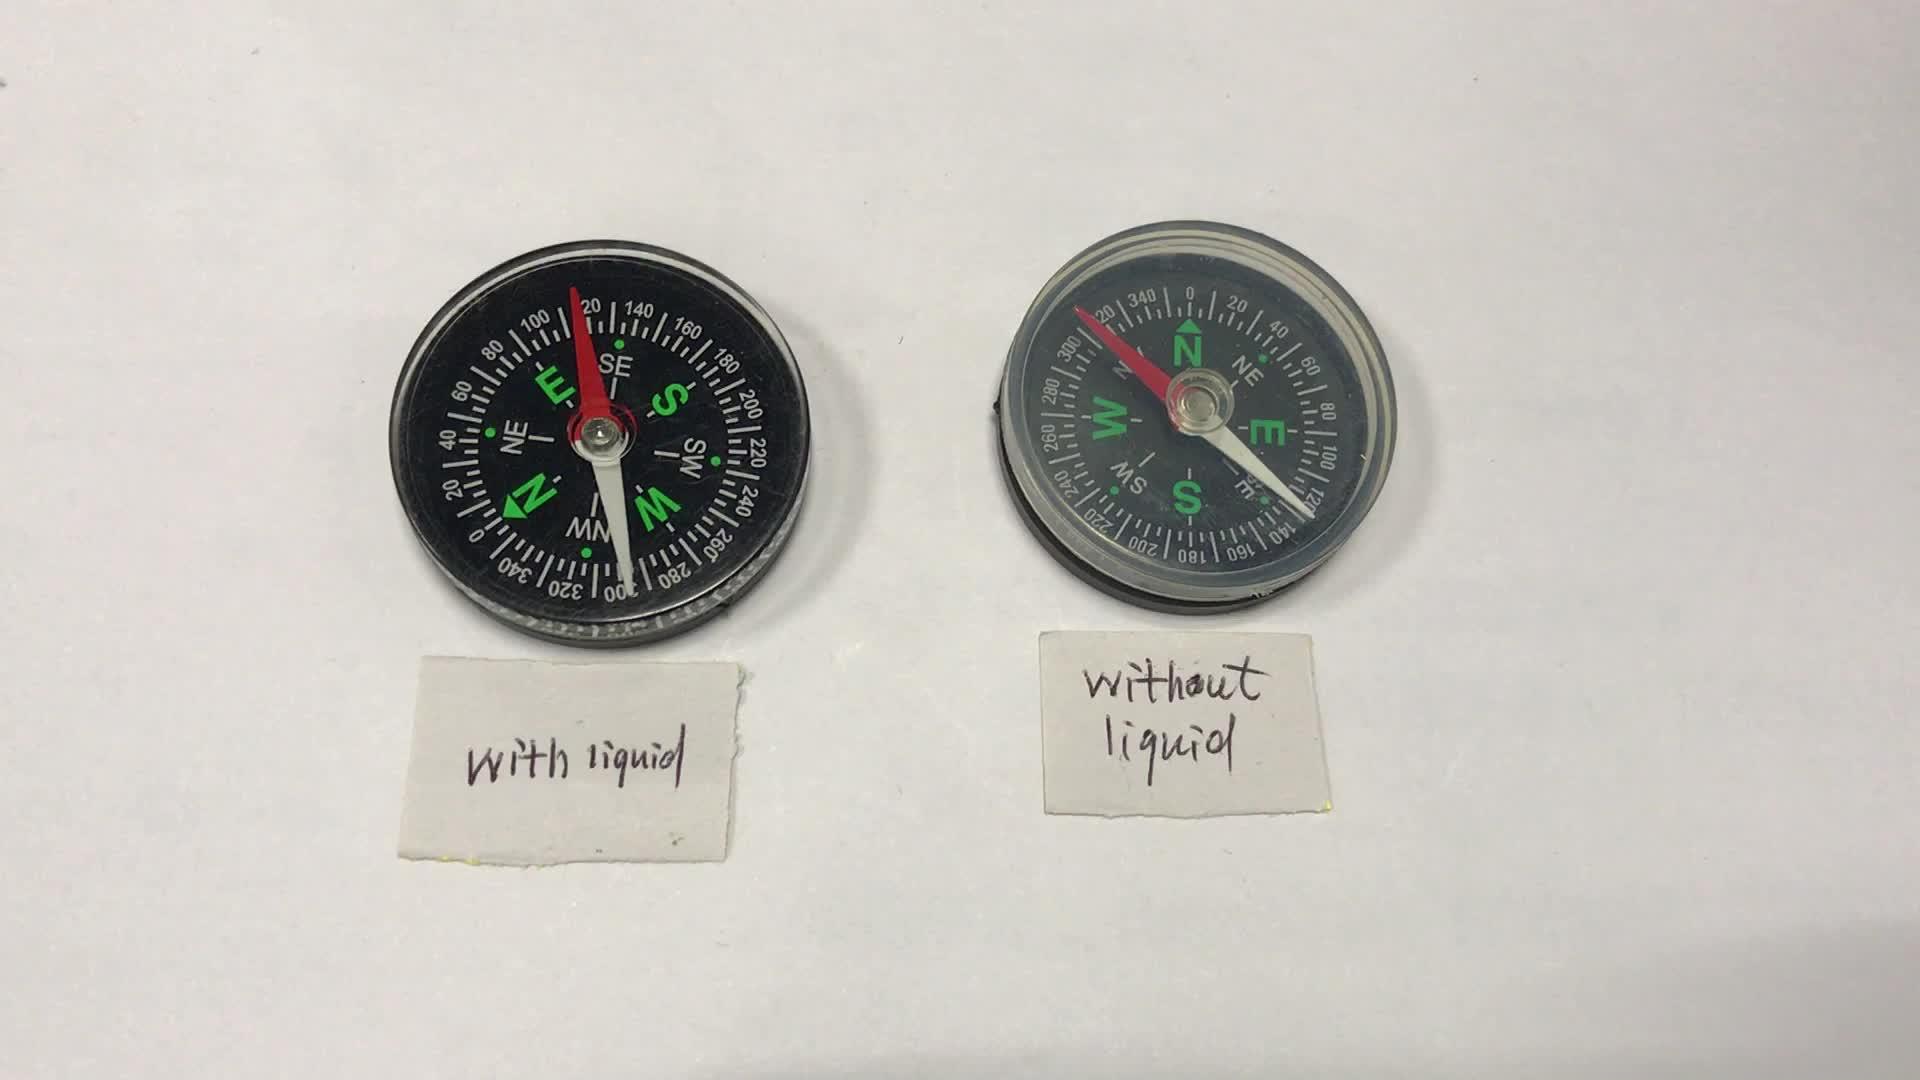 Plastic kompas Fabricage Plastic Kompas Met Vloeistof Gevuld Met Hoge Kwaliteit